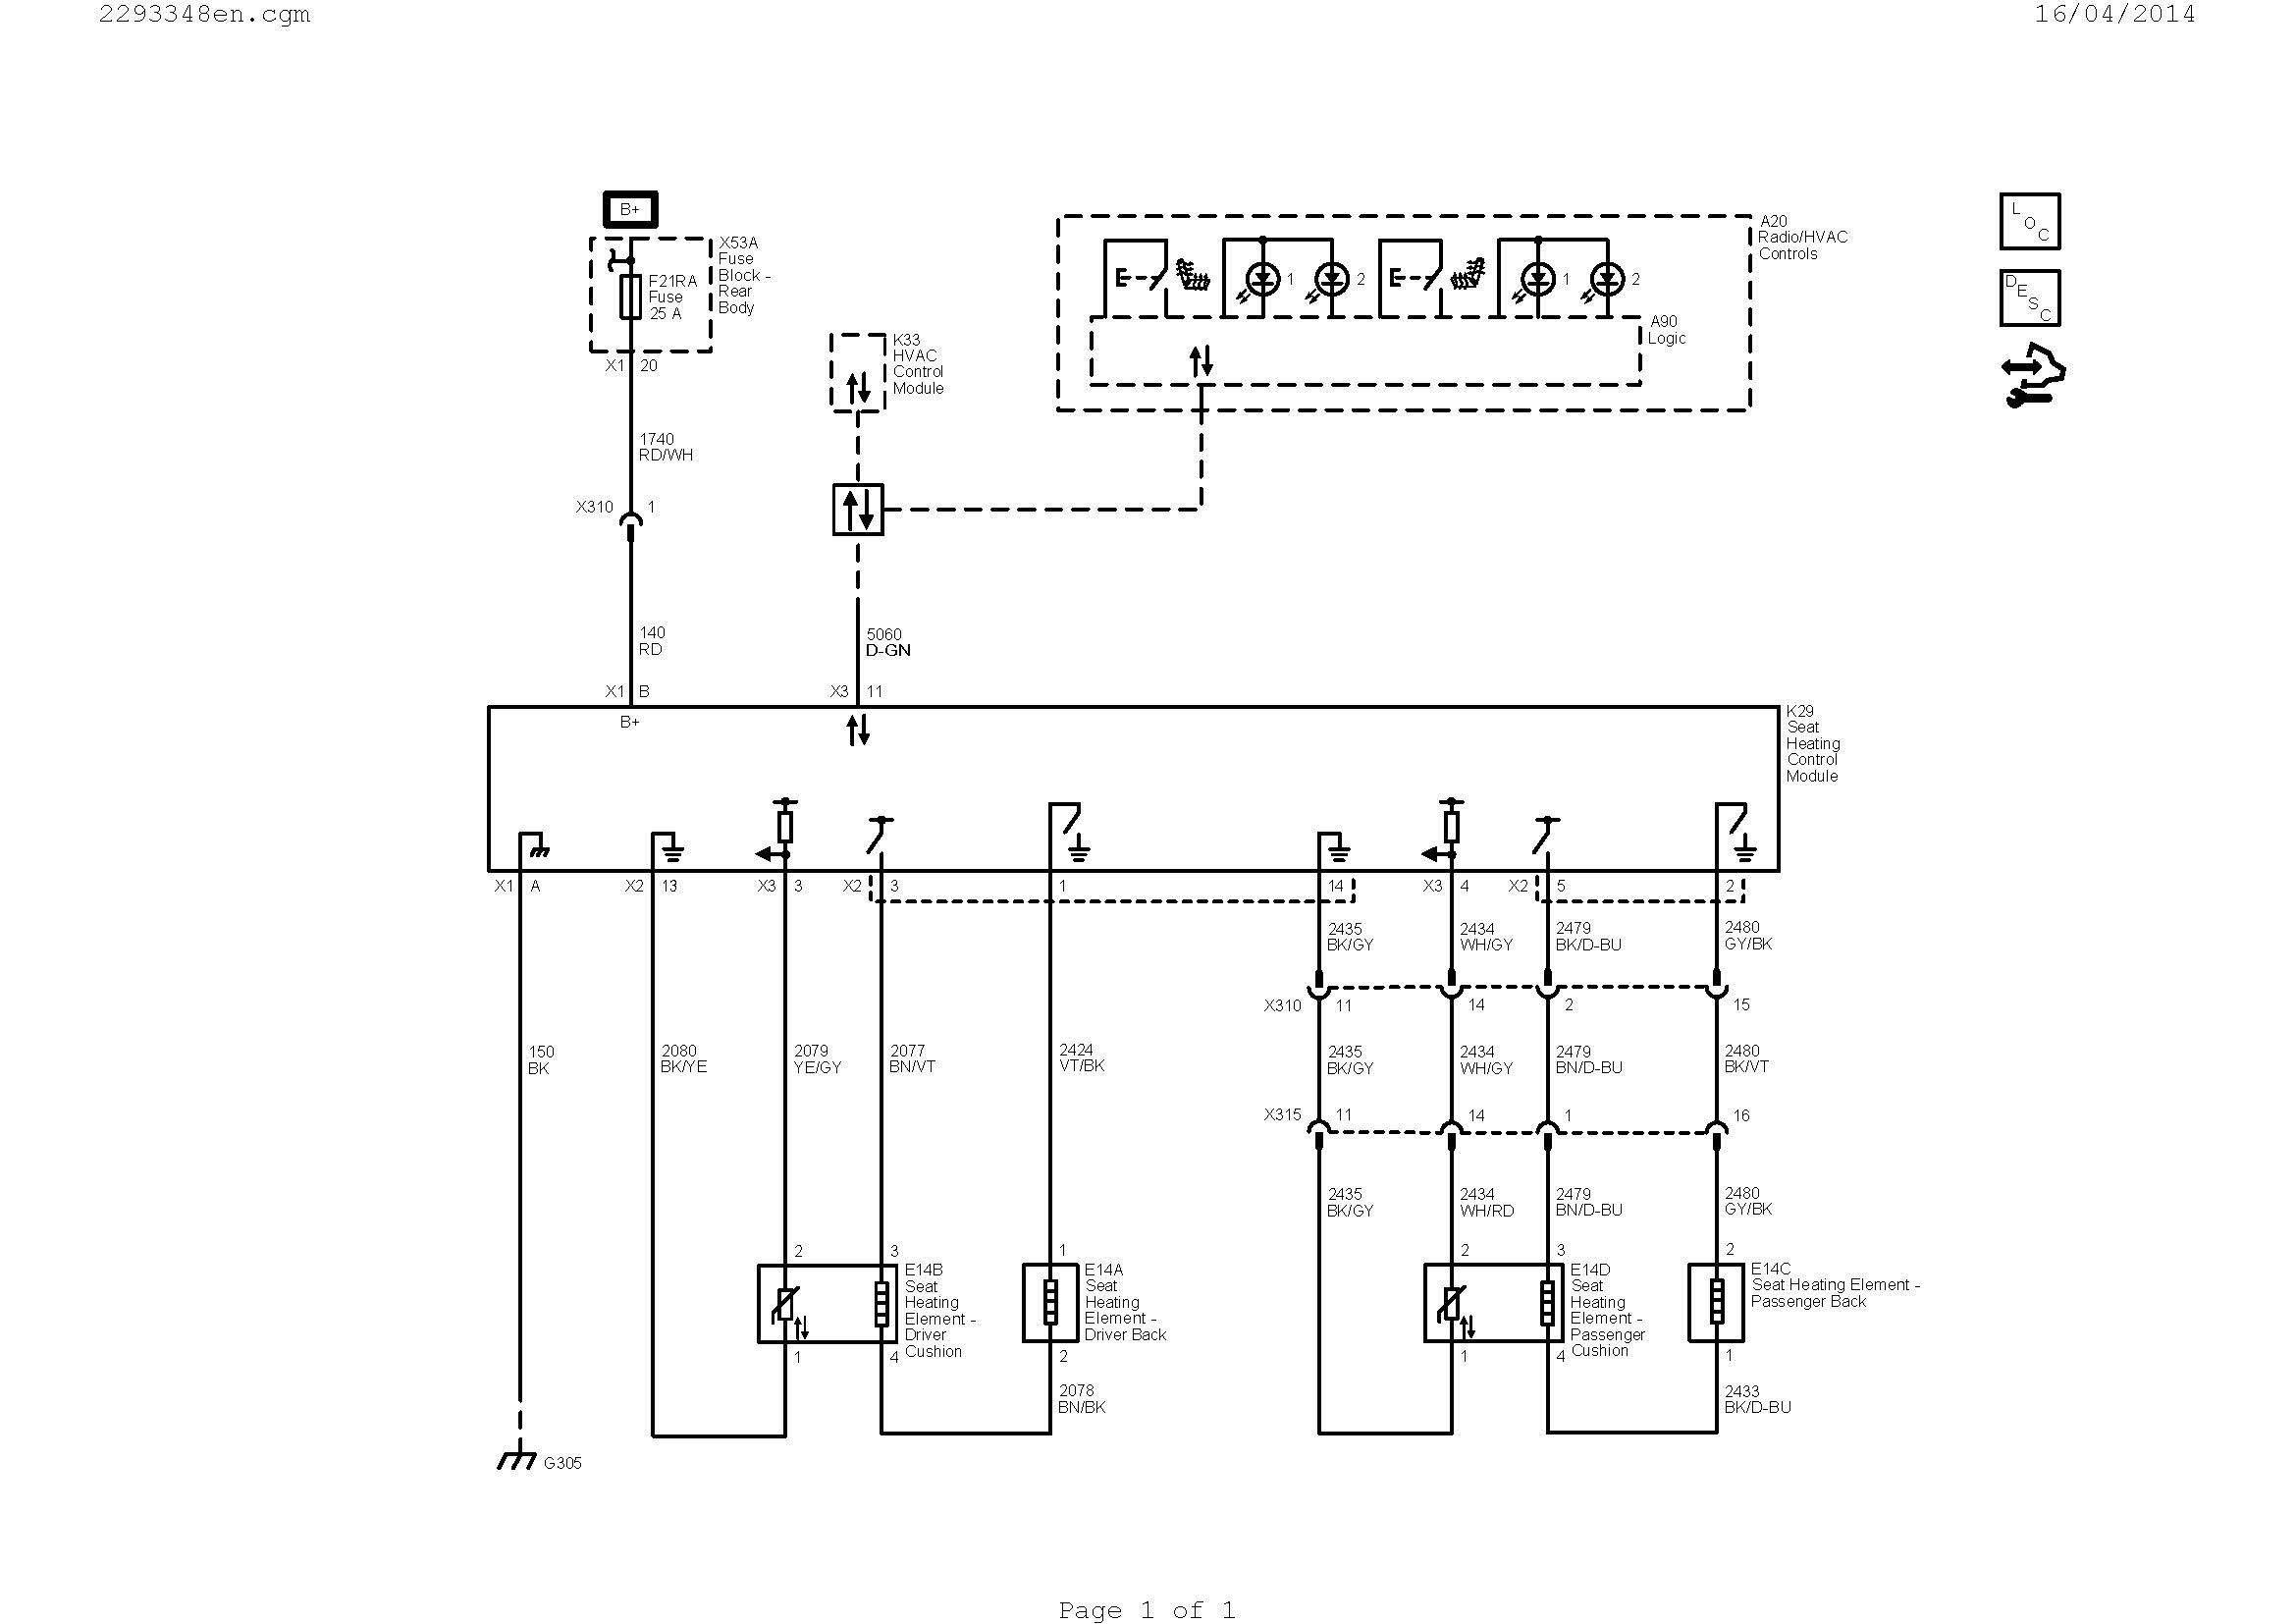 medium resolution of honda c70 wiring diagram images fresh wiring diagram for light bulb throughout electrical plug wiring diagram